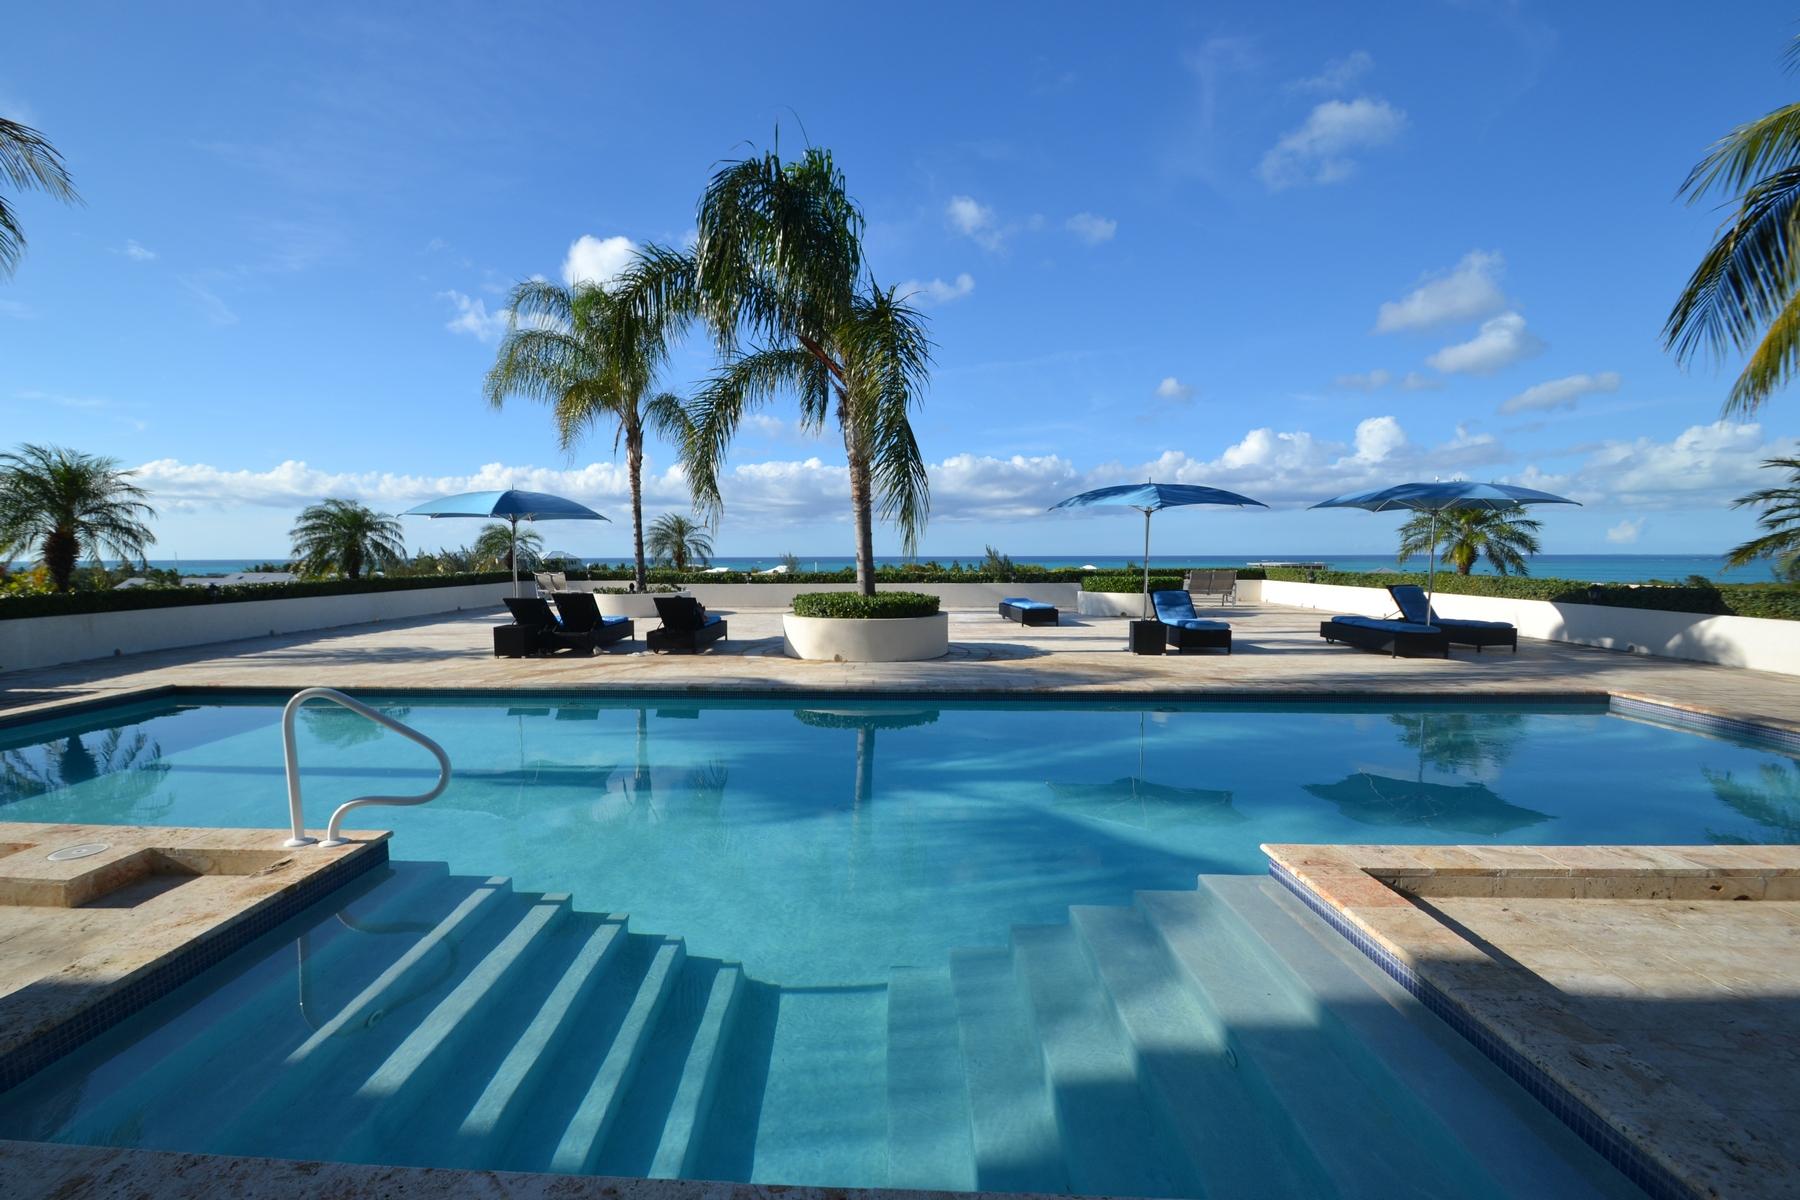 Condominium for Sale at La Vista Azul ~ Suite 53025-302 Turtle Cove, Providenciales Turks And Caicos Islands